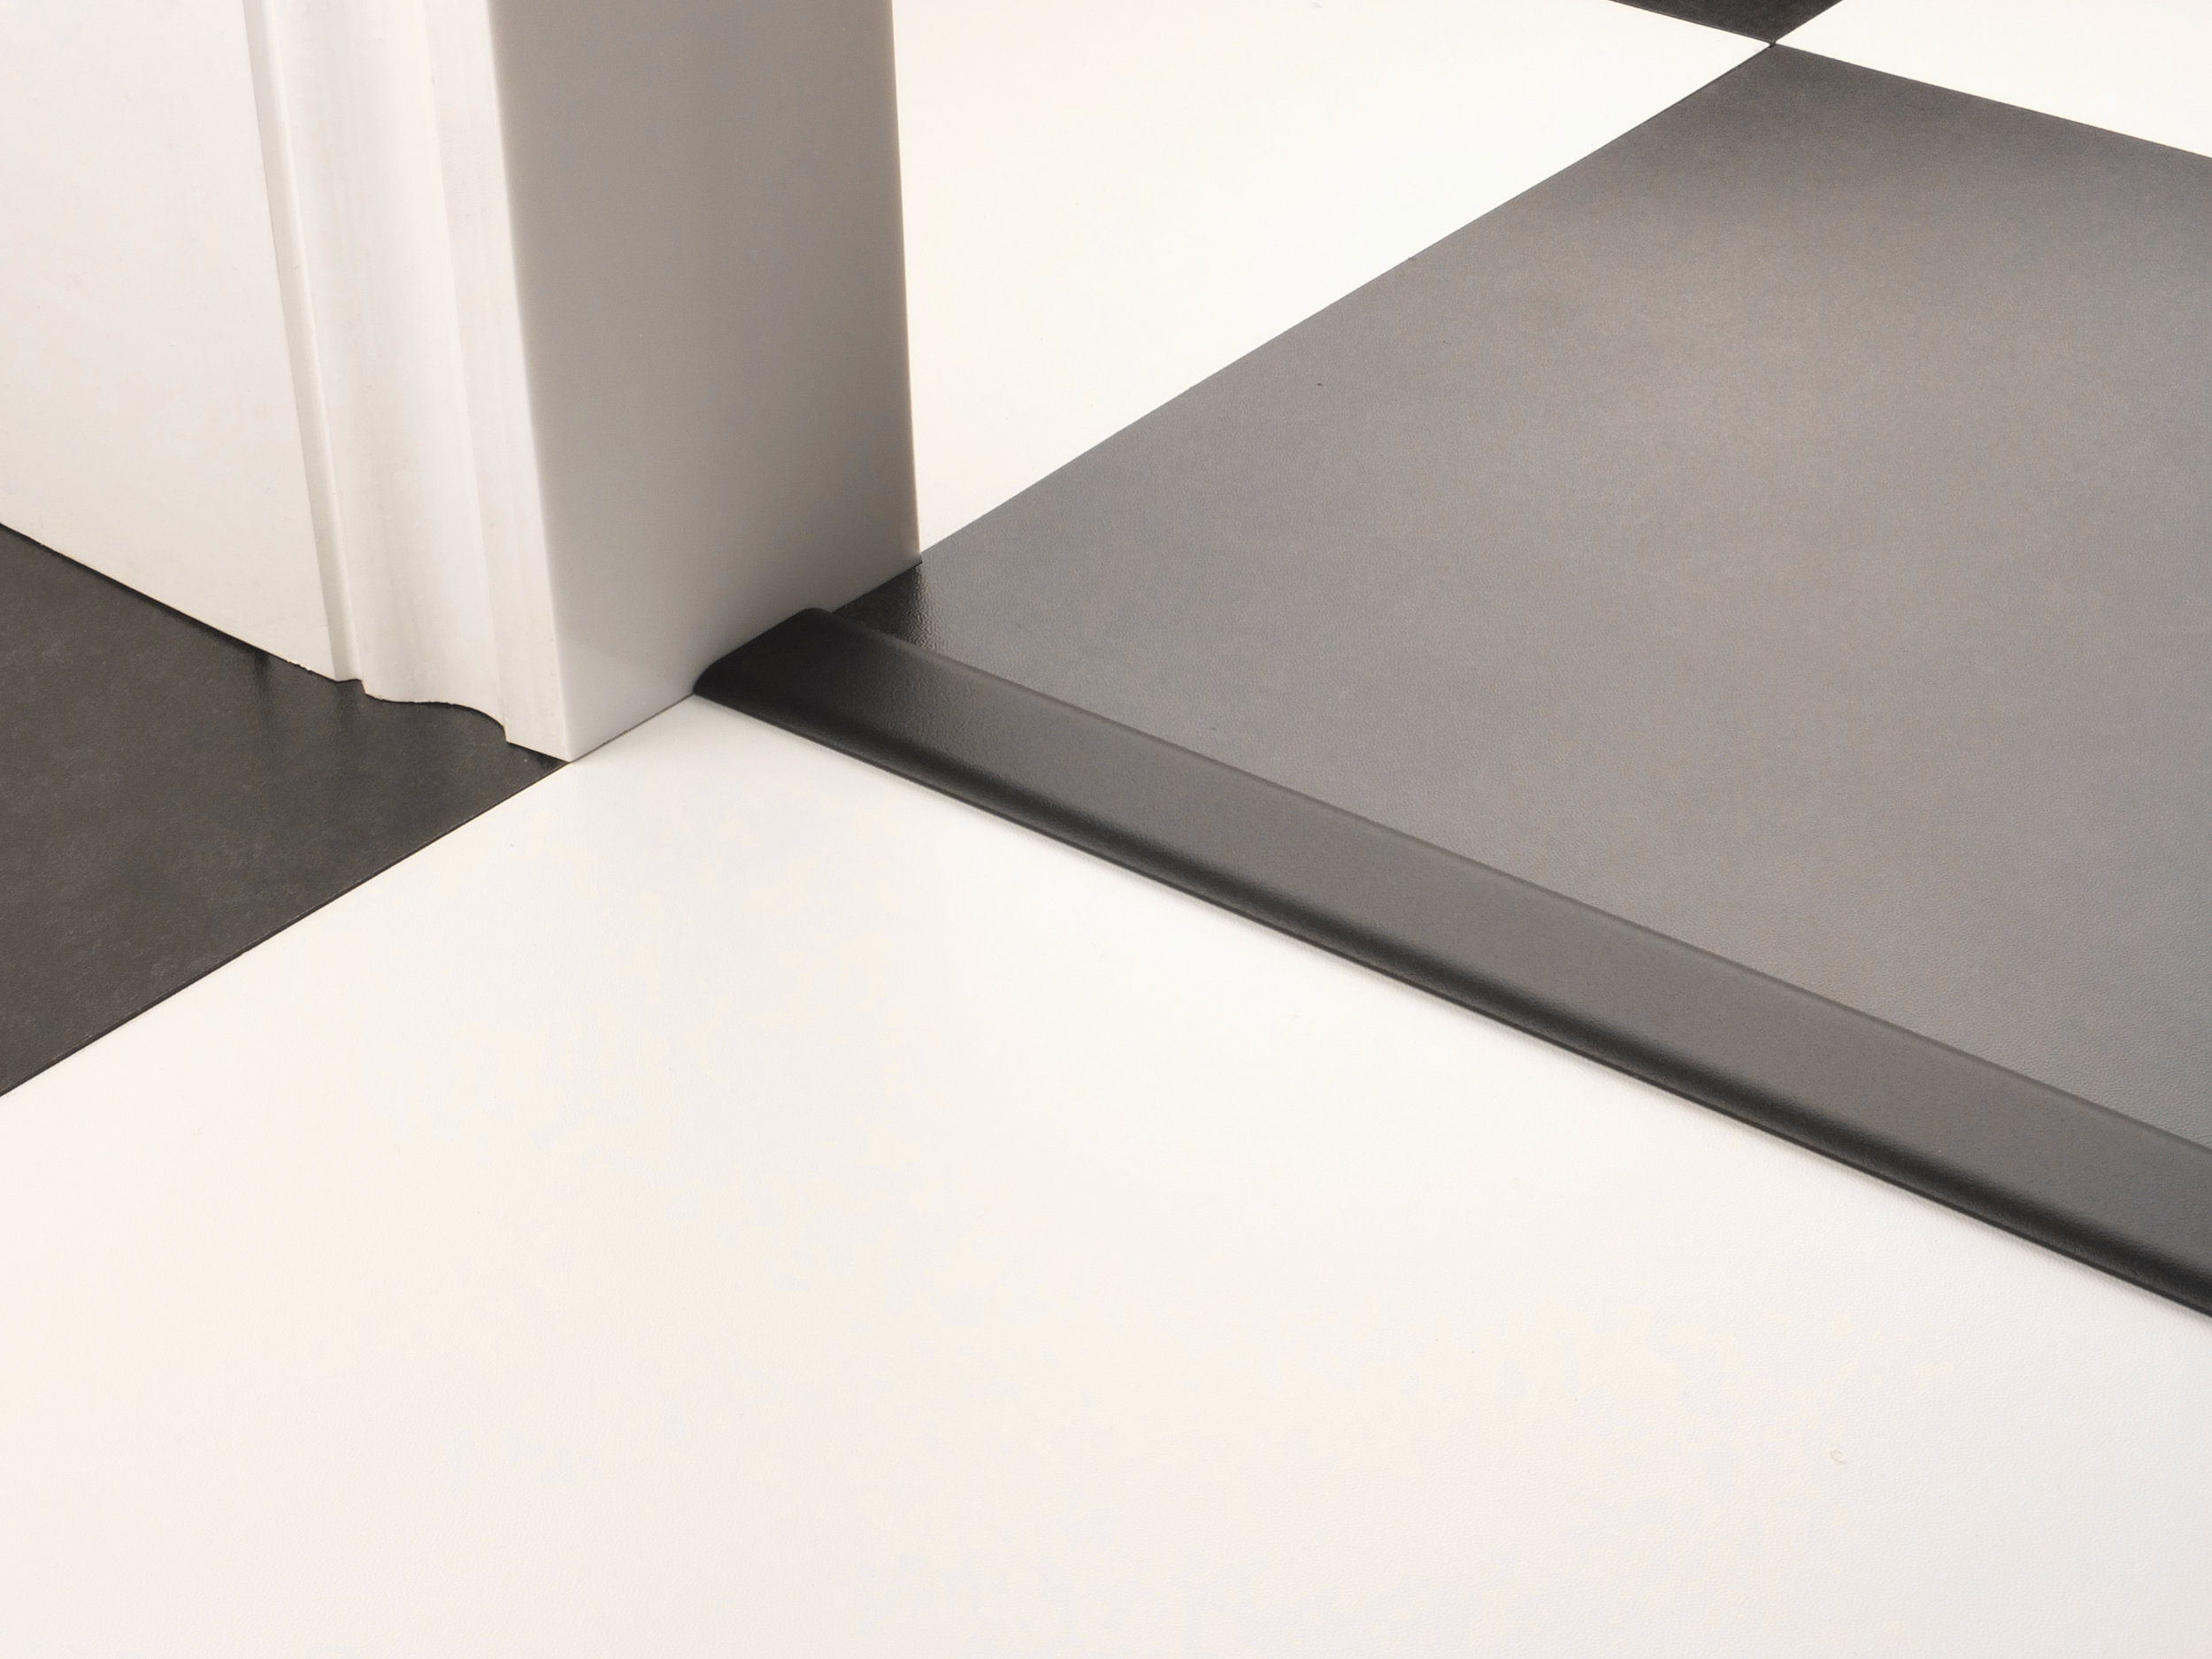 stairrods-doorbar-black-eurocover.jpg